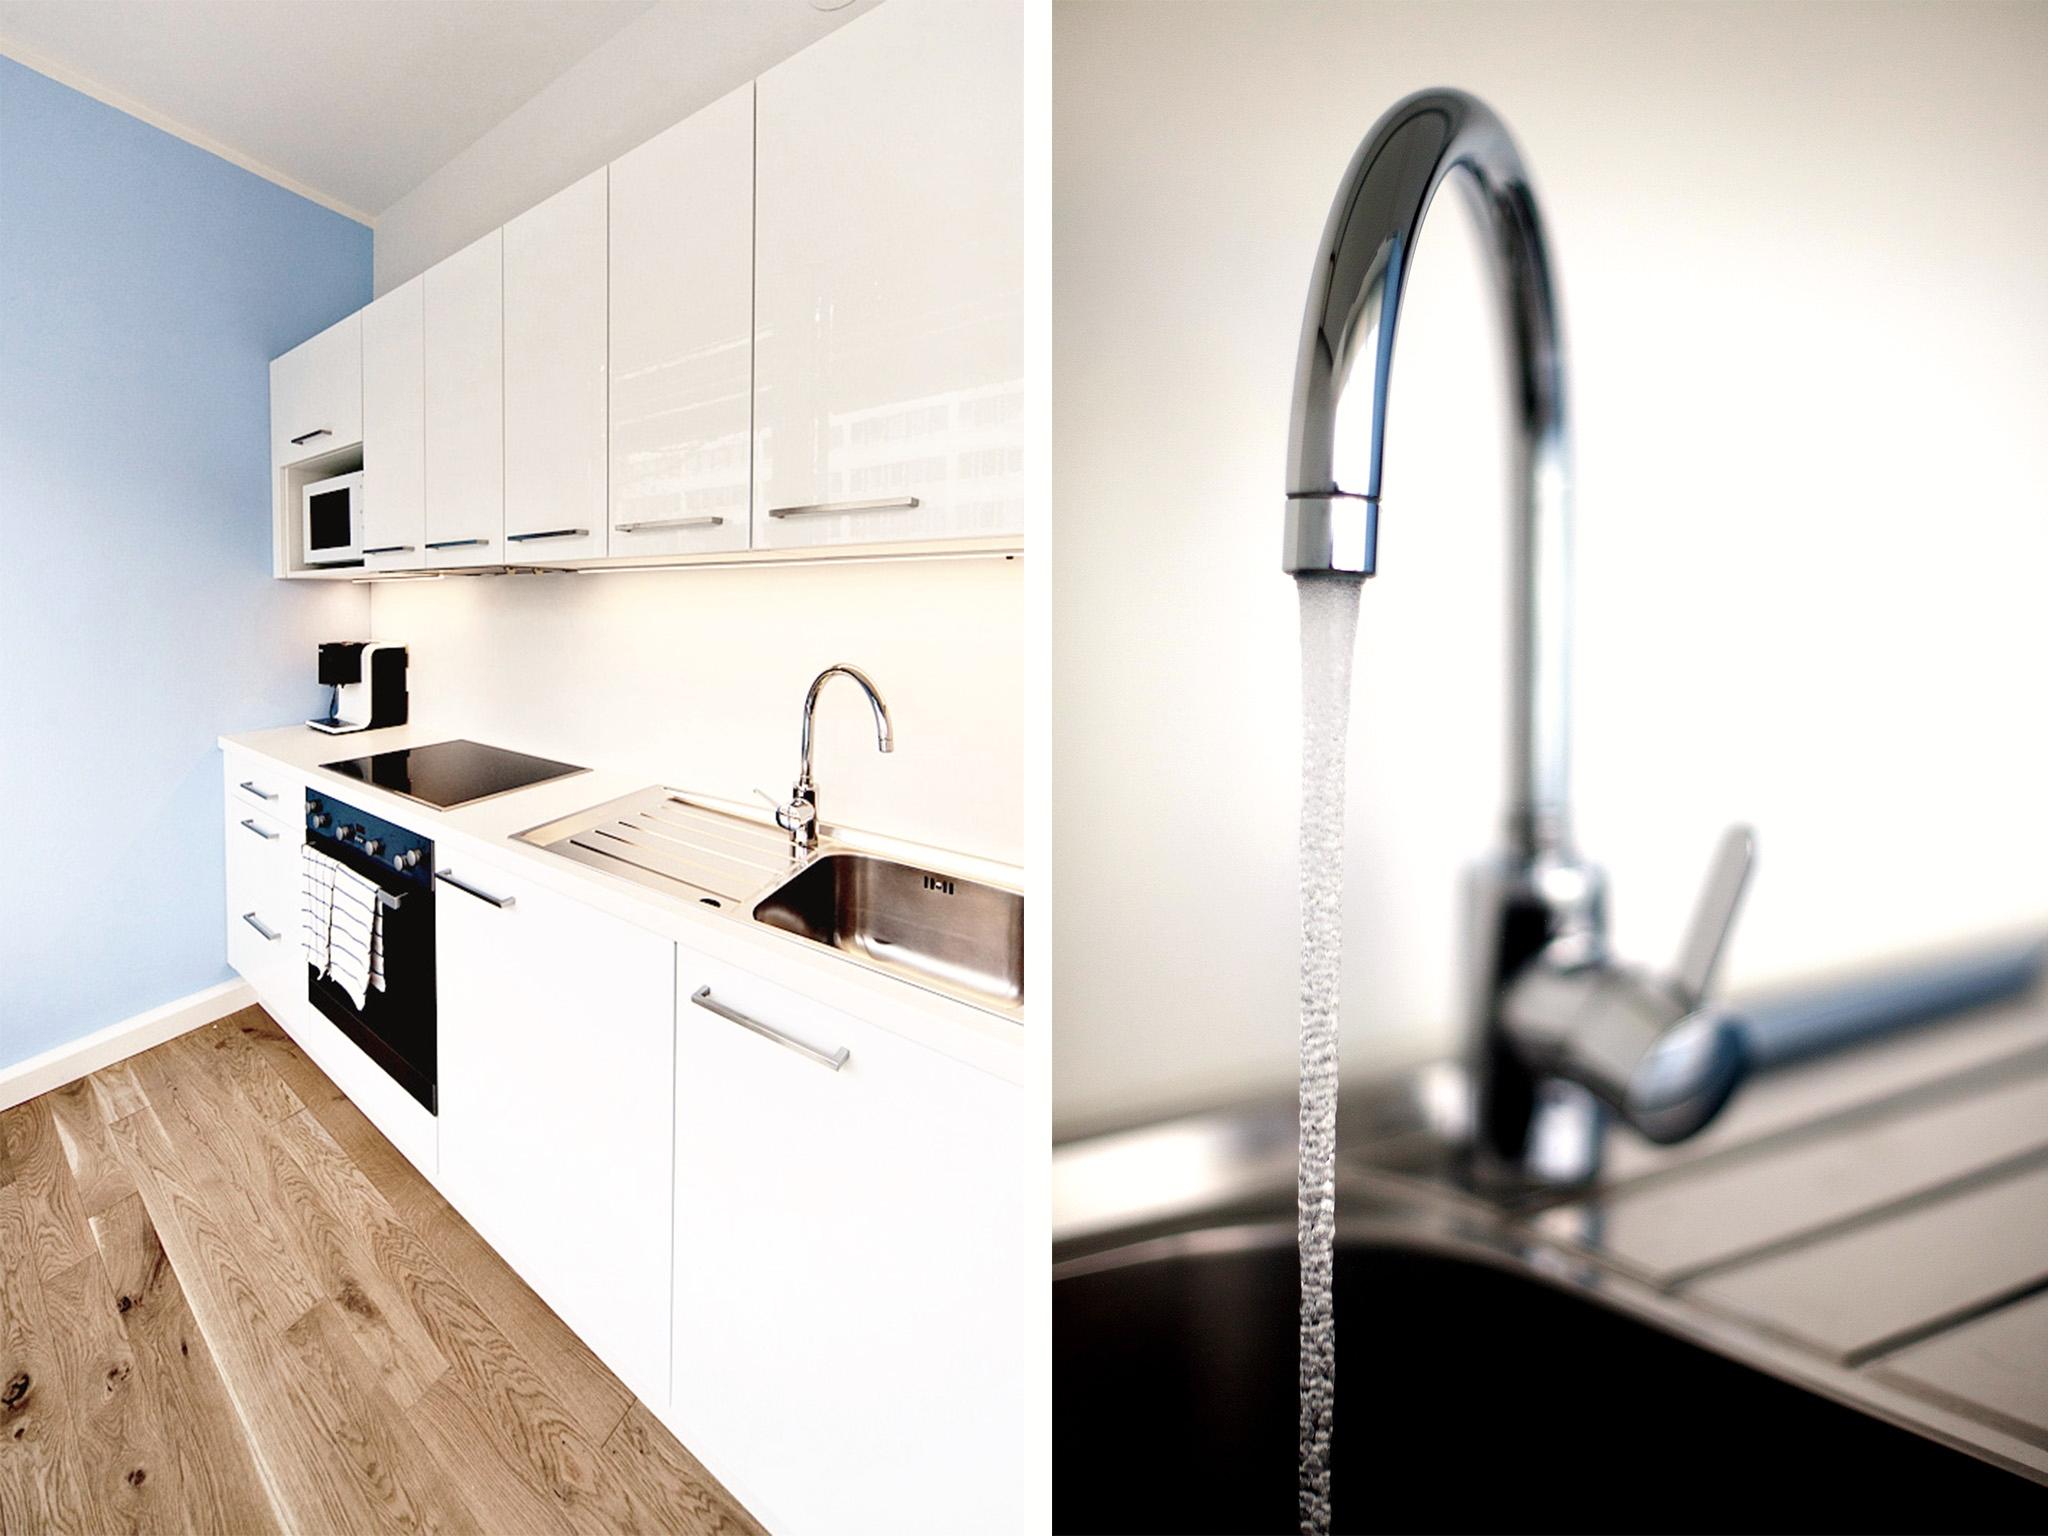 water prater apartments. Black Bedroom Furniture Sets. Home Design Ideas